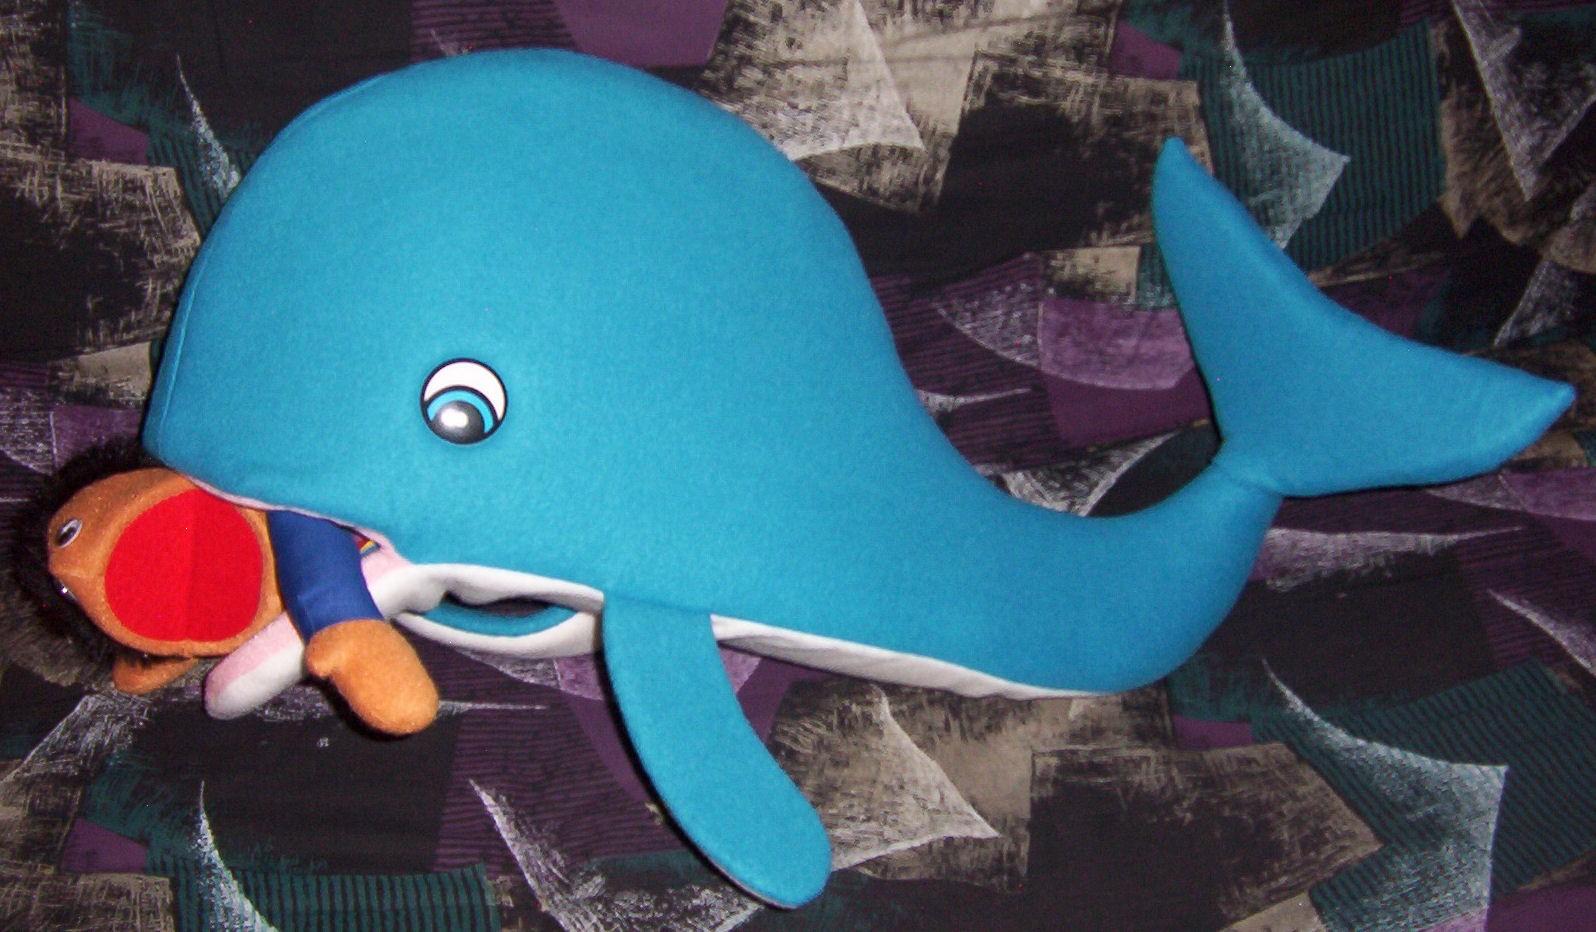 Mini-Whale swallowing Jonah